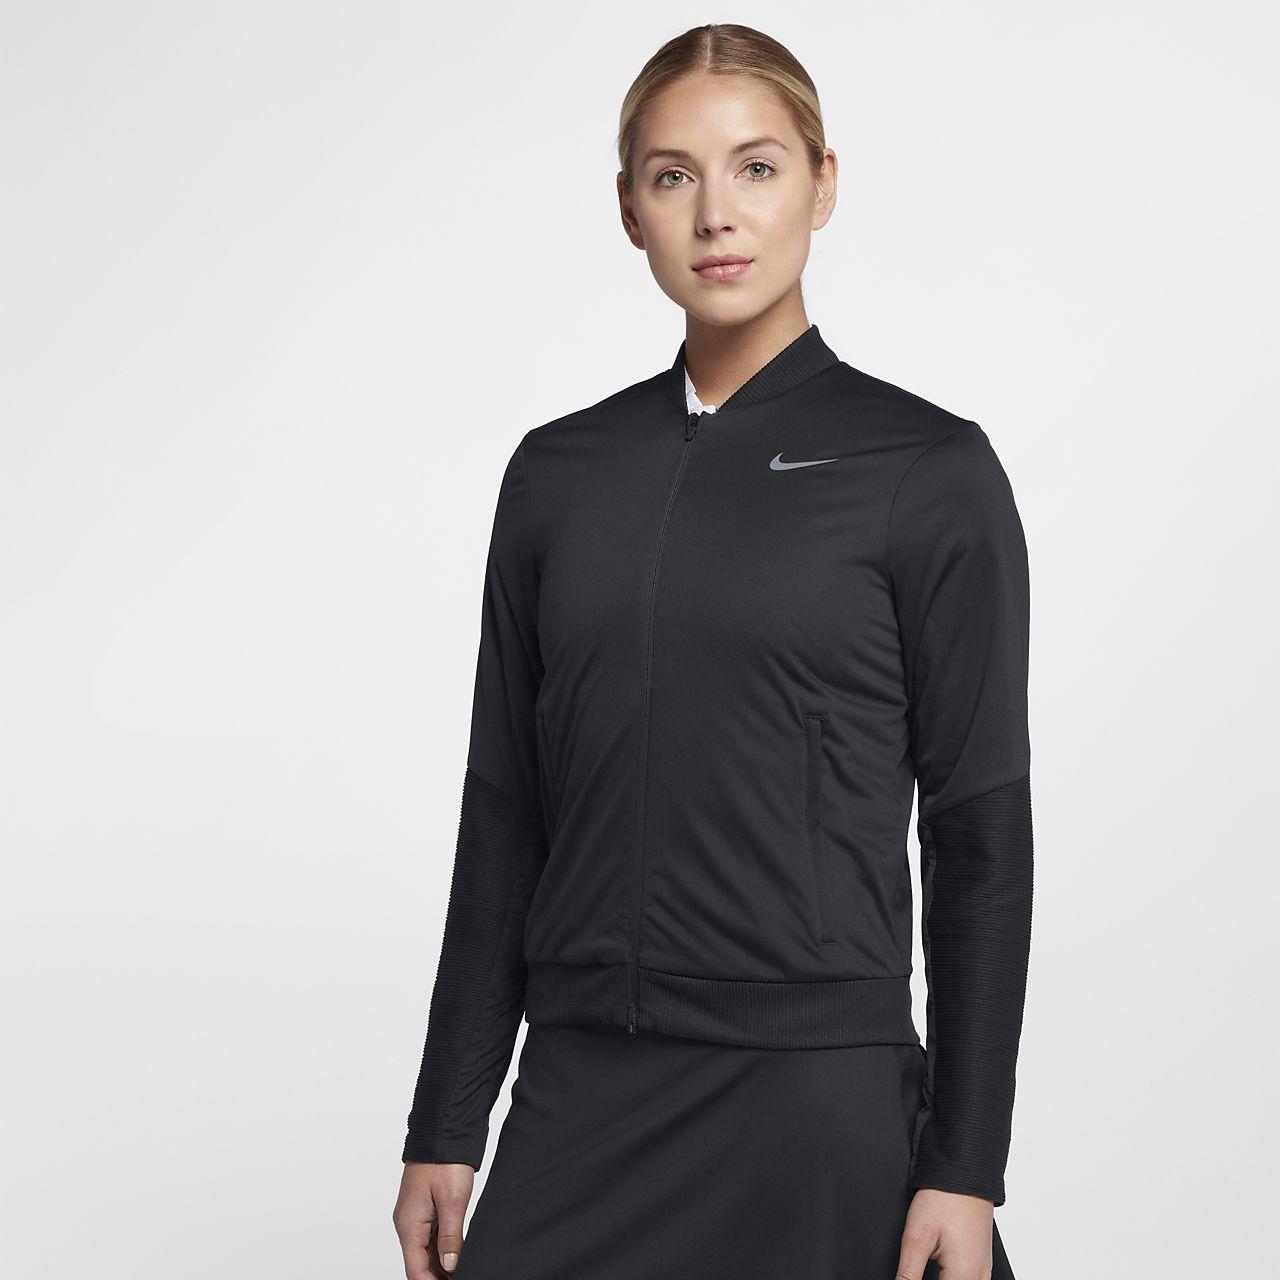 Womens Nike Aerolayer Black Golf Vest